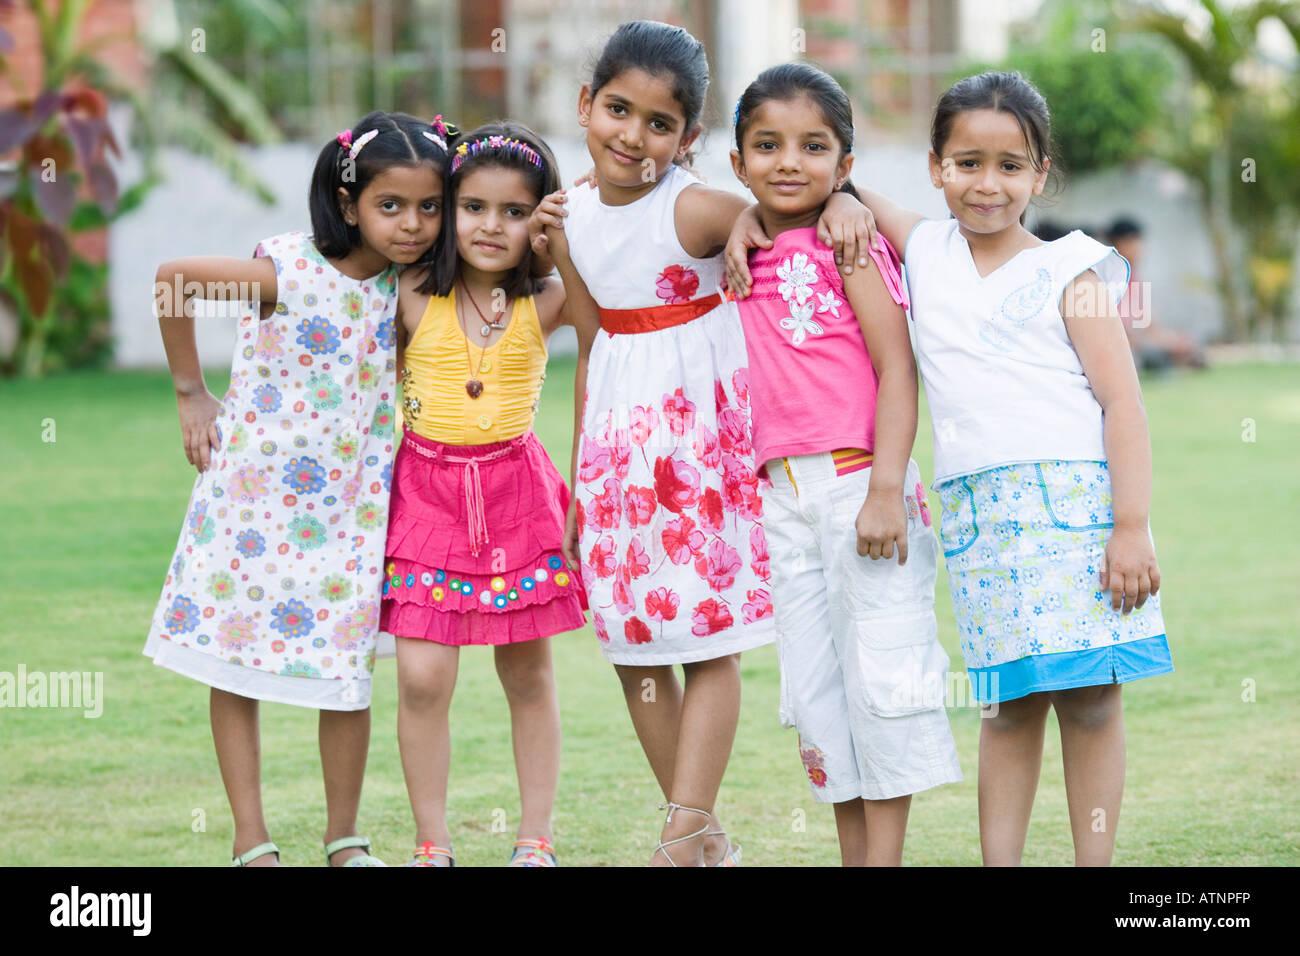 Retrato de cinco niñas de pie en un césped Imagen De Stock